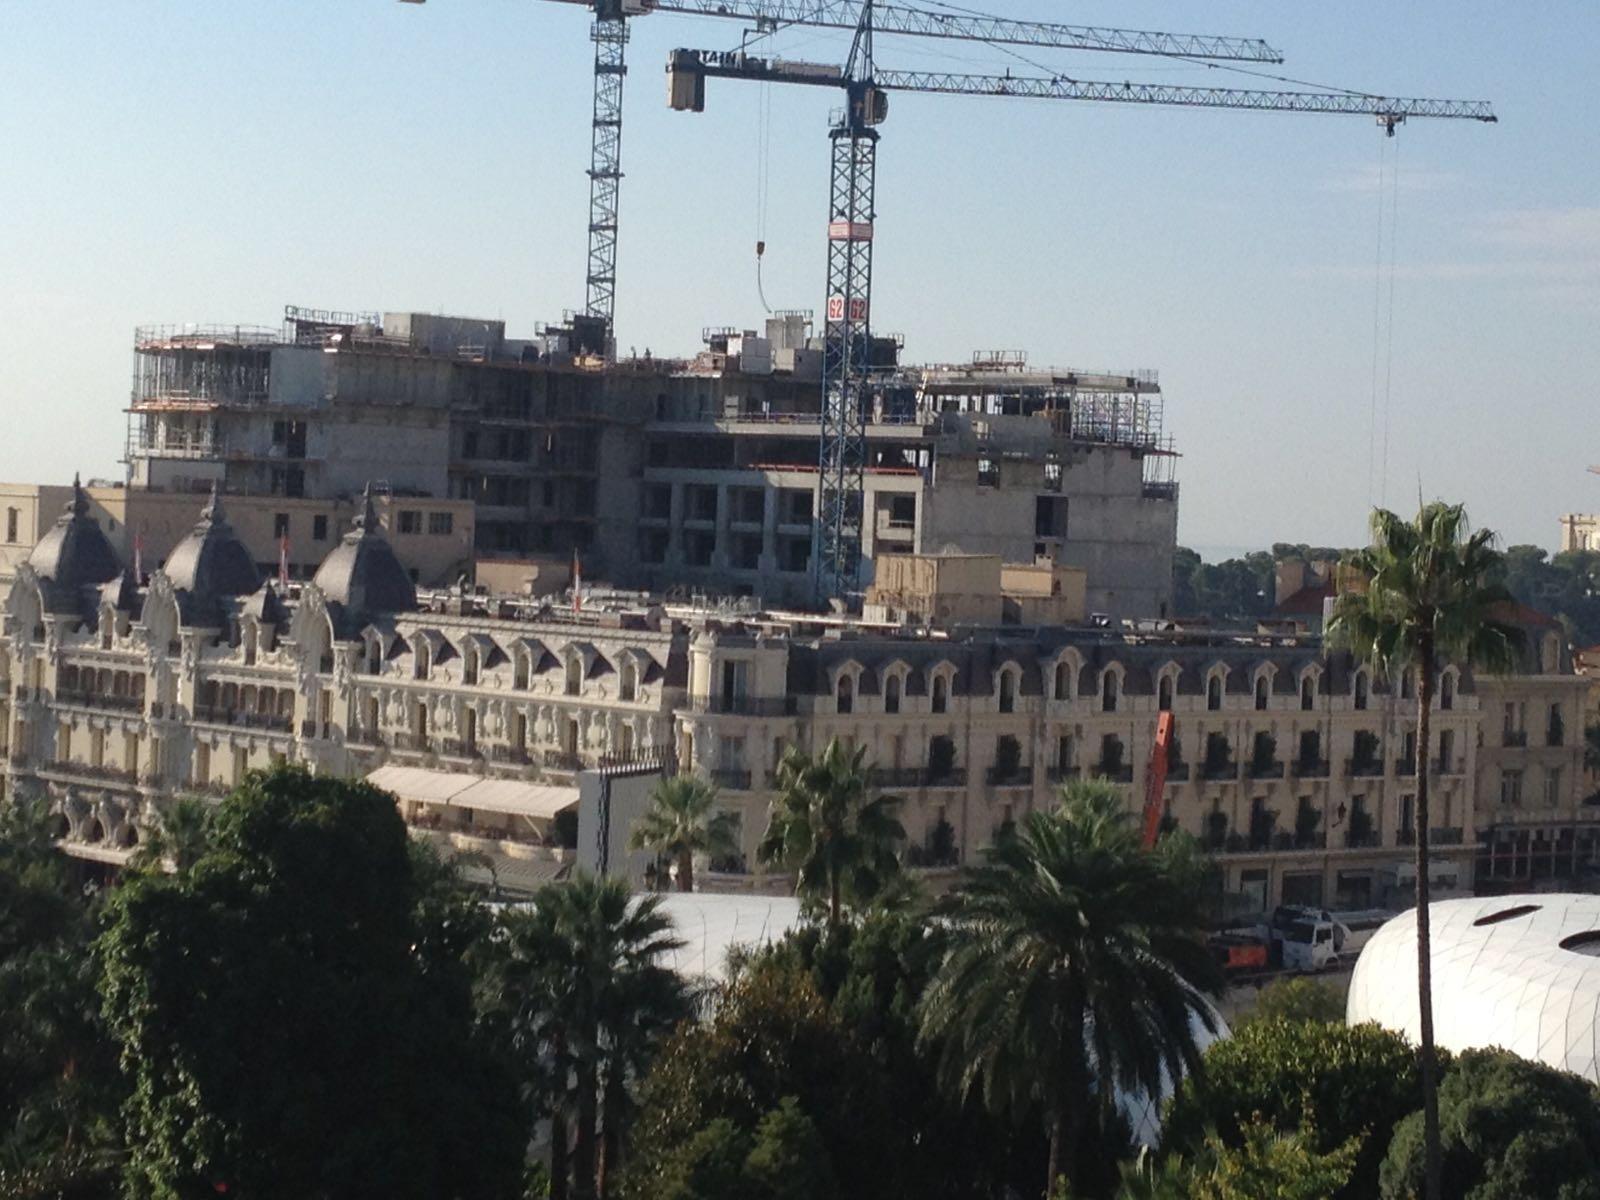 Hotel Des Etats Unis Paris